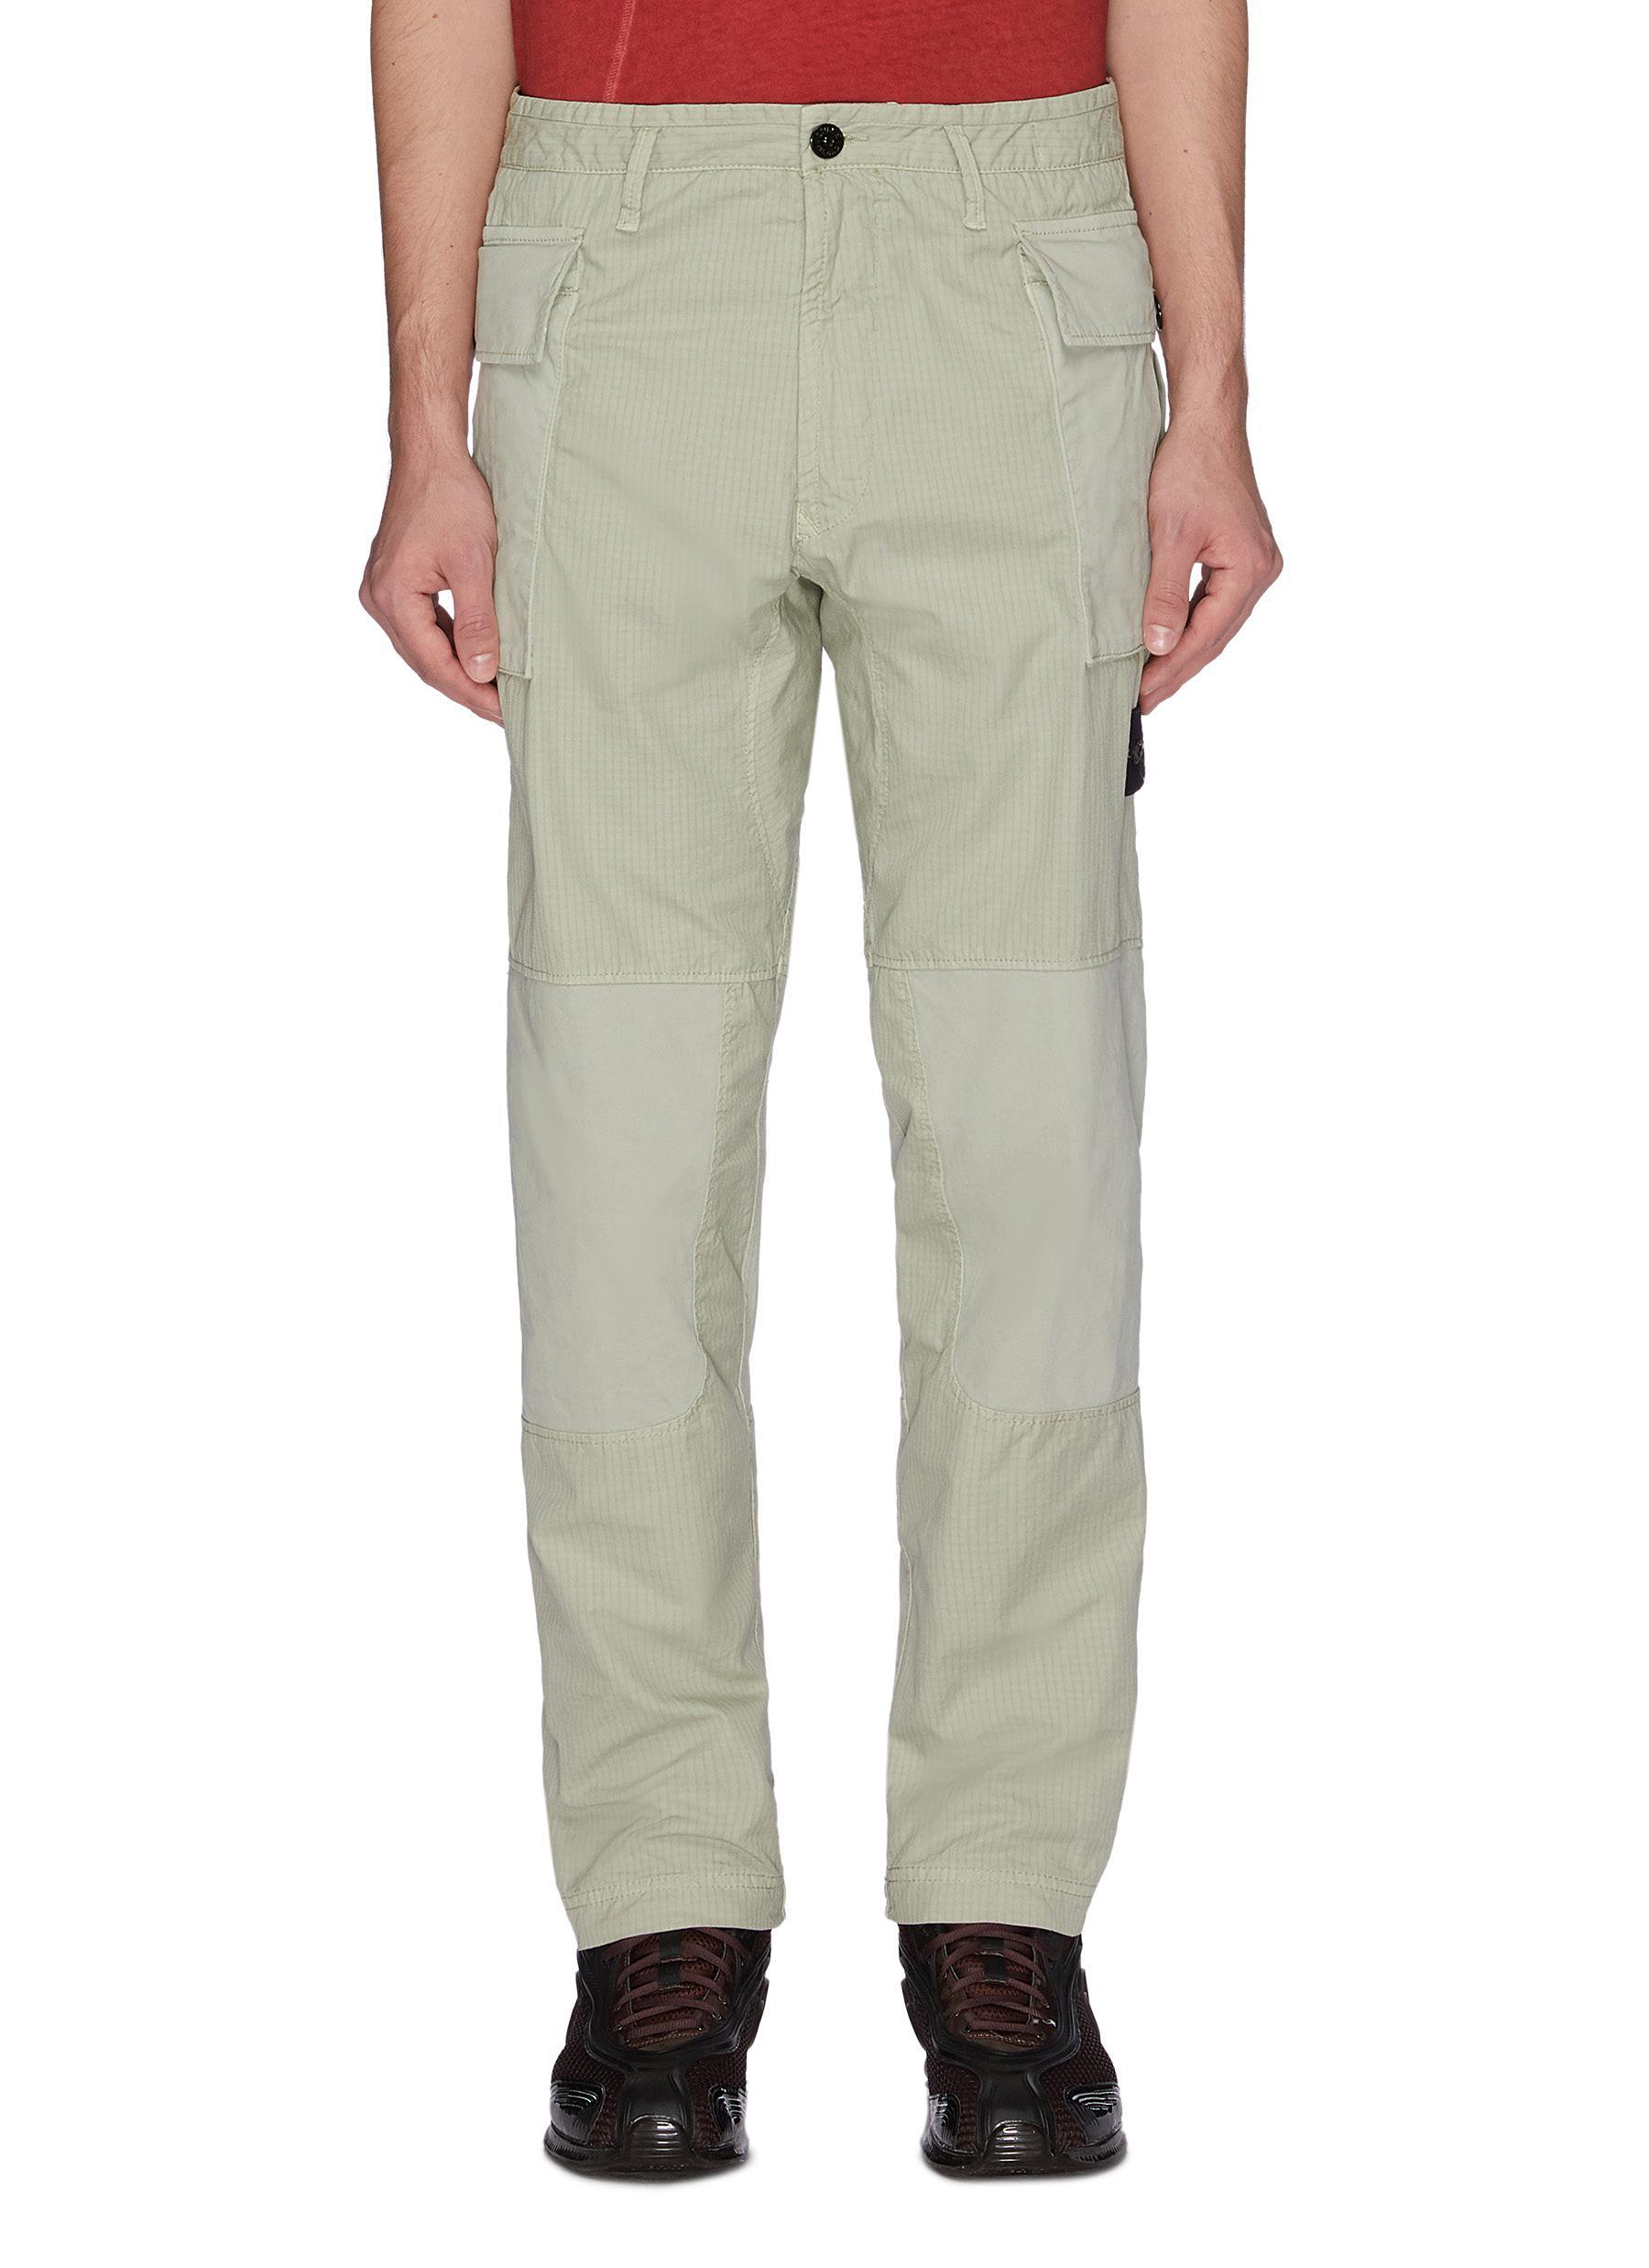 Stone Island Pants 'Ripstop' cargo pants